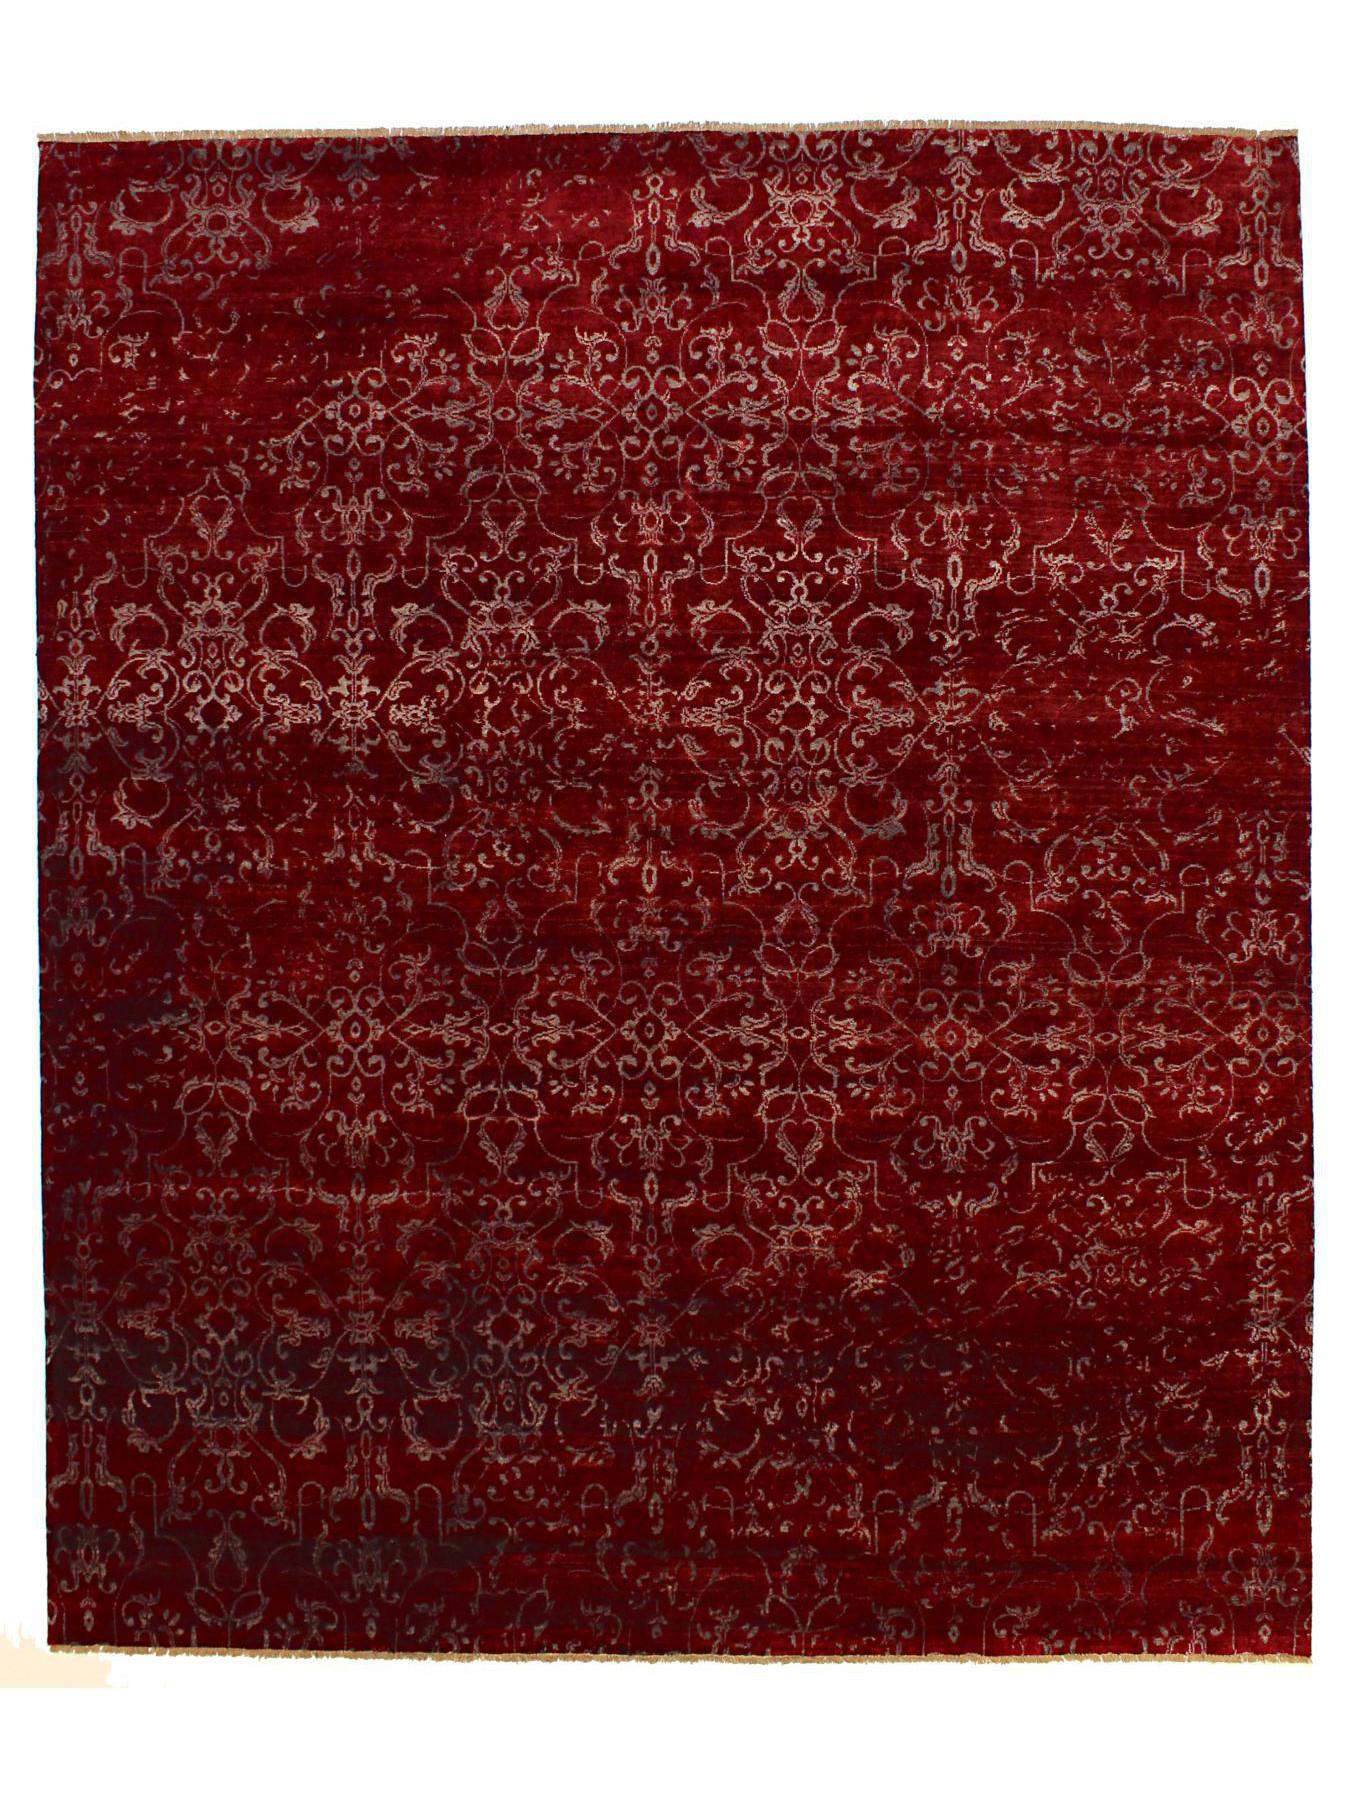 Luxury carpets - Damask-AL-198E F-1/B-42 Outlet